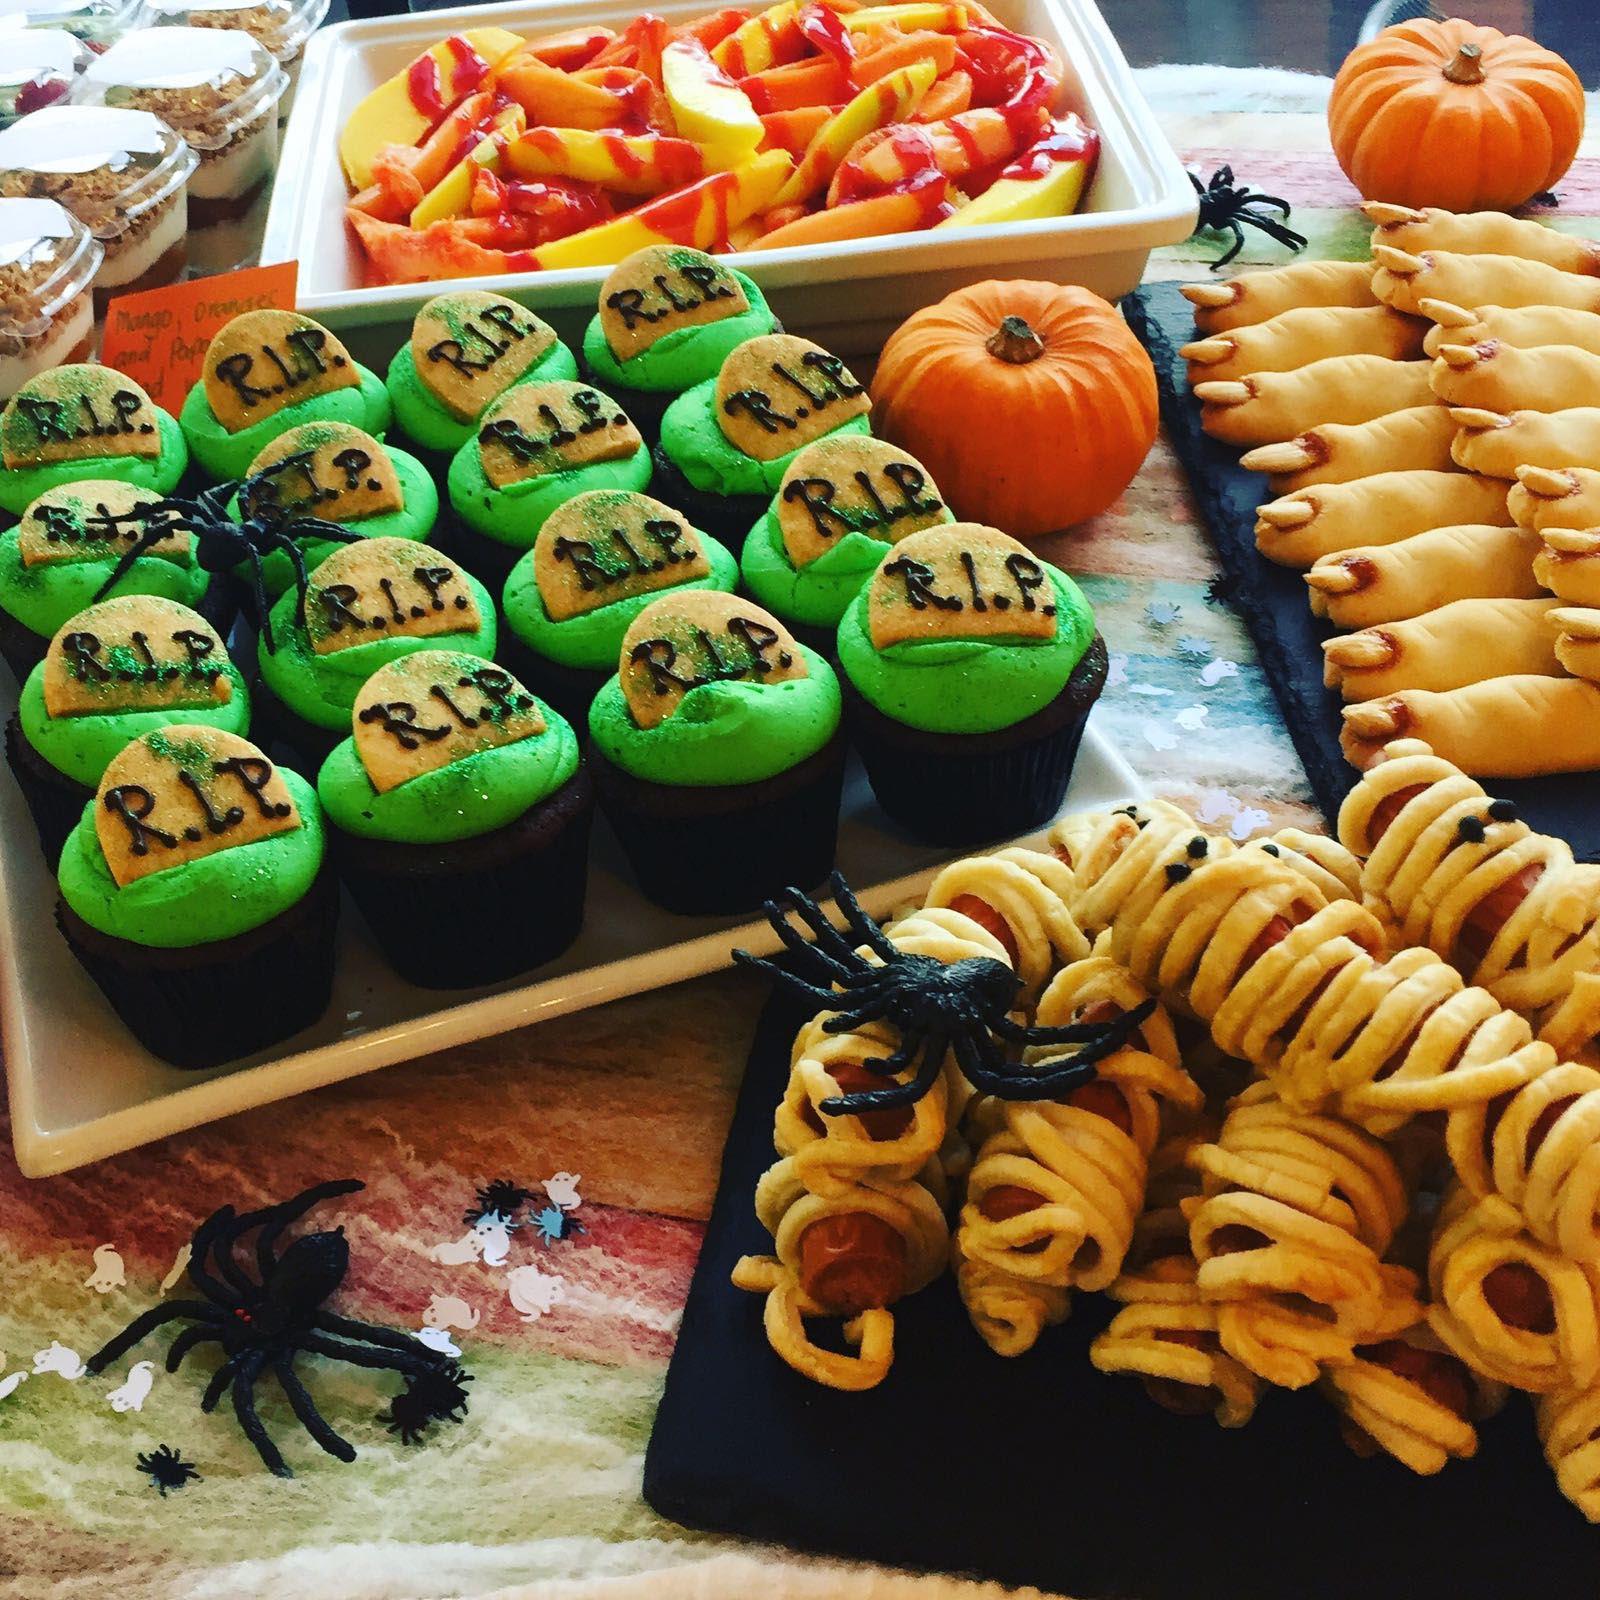 Amazing 'To Die For' Halloween Breakfast